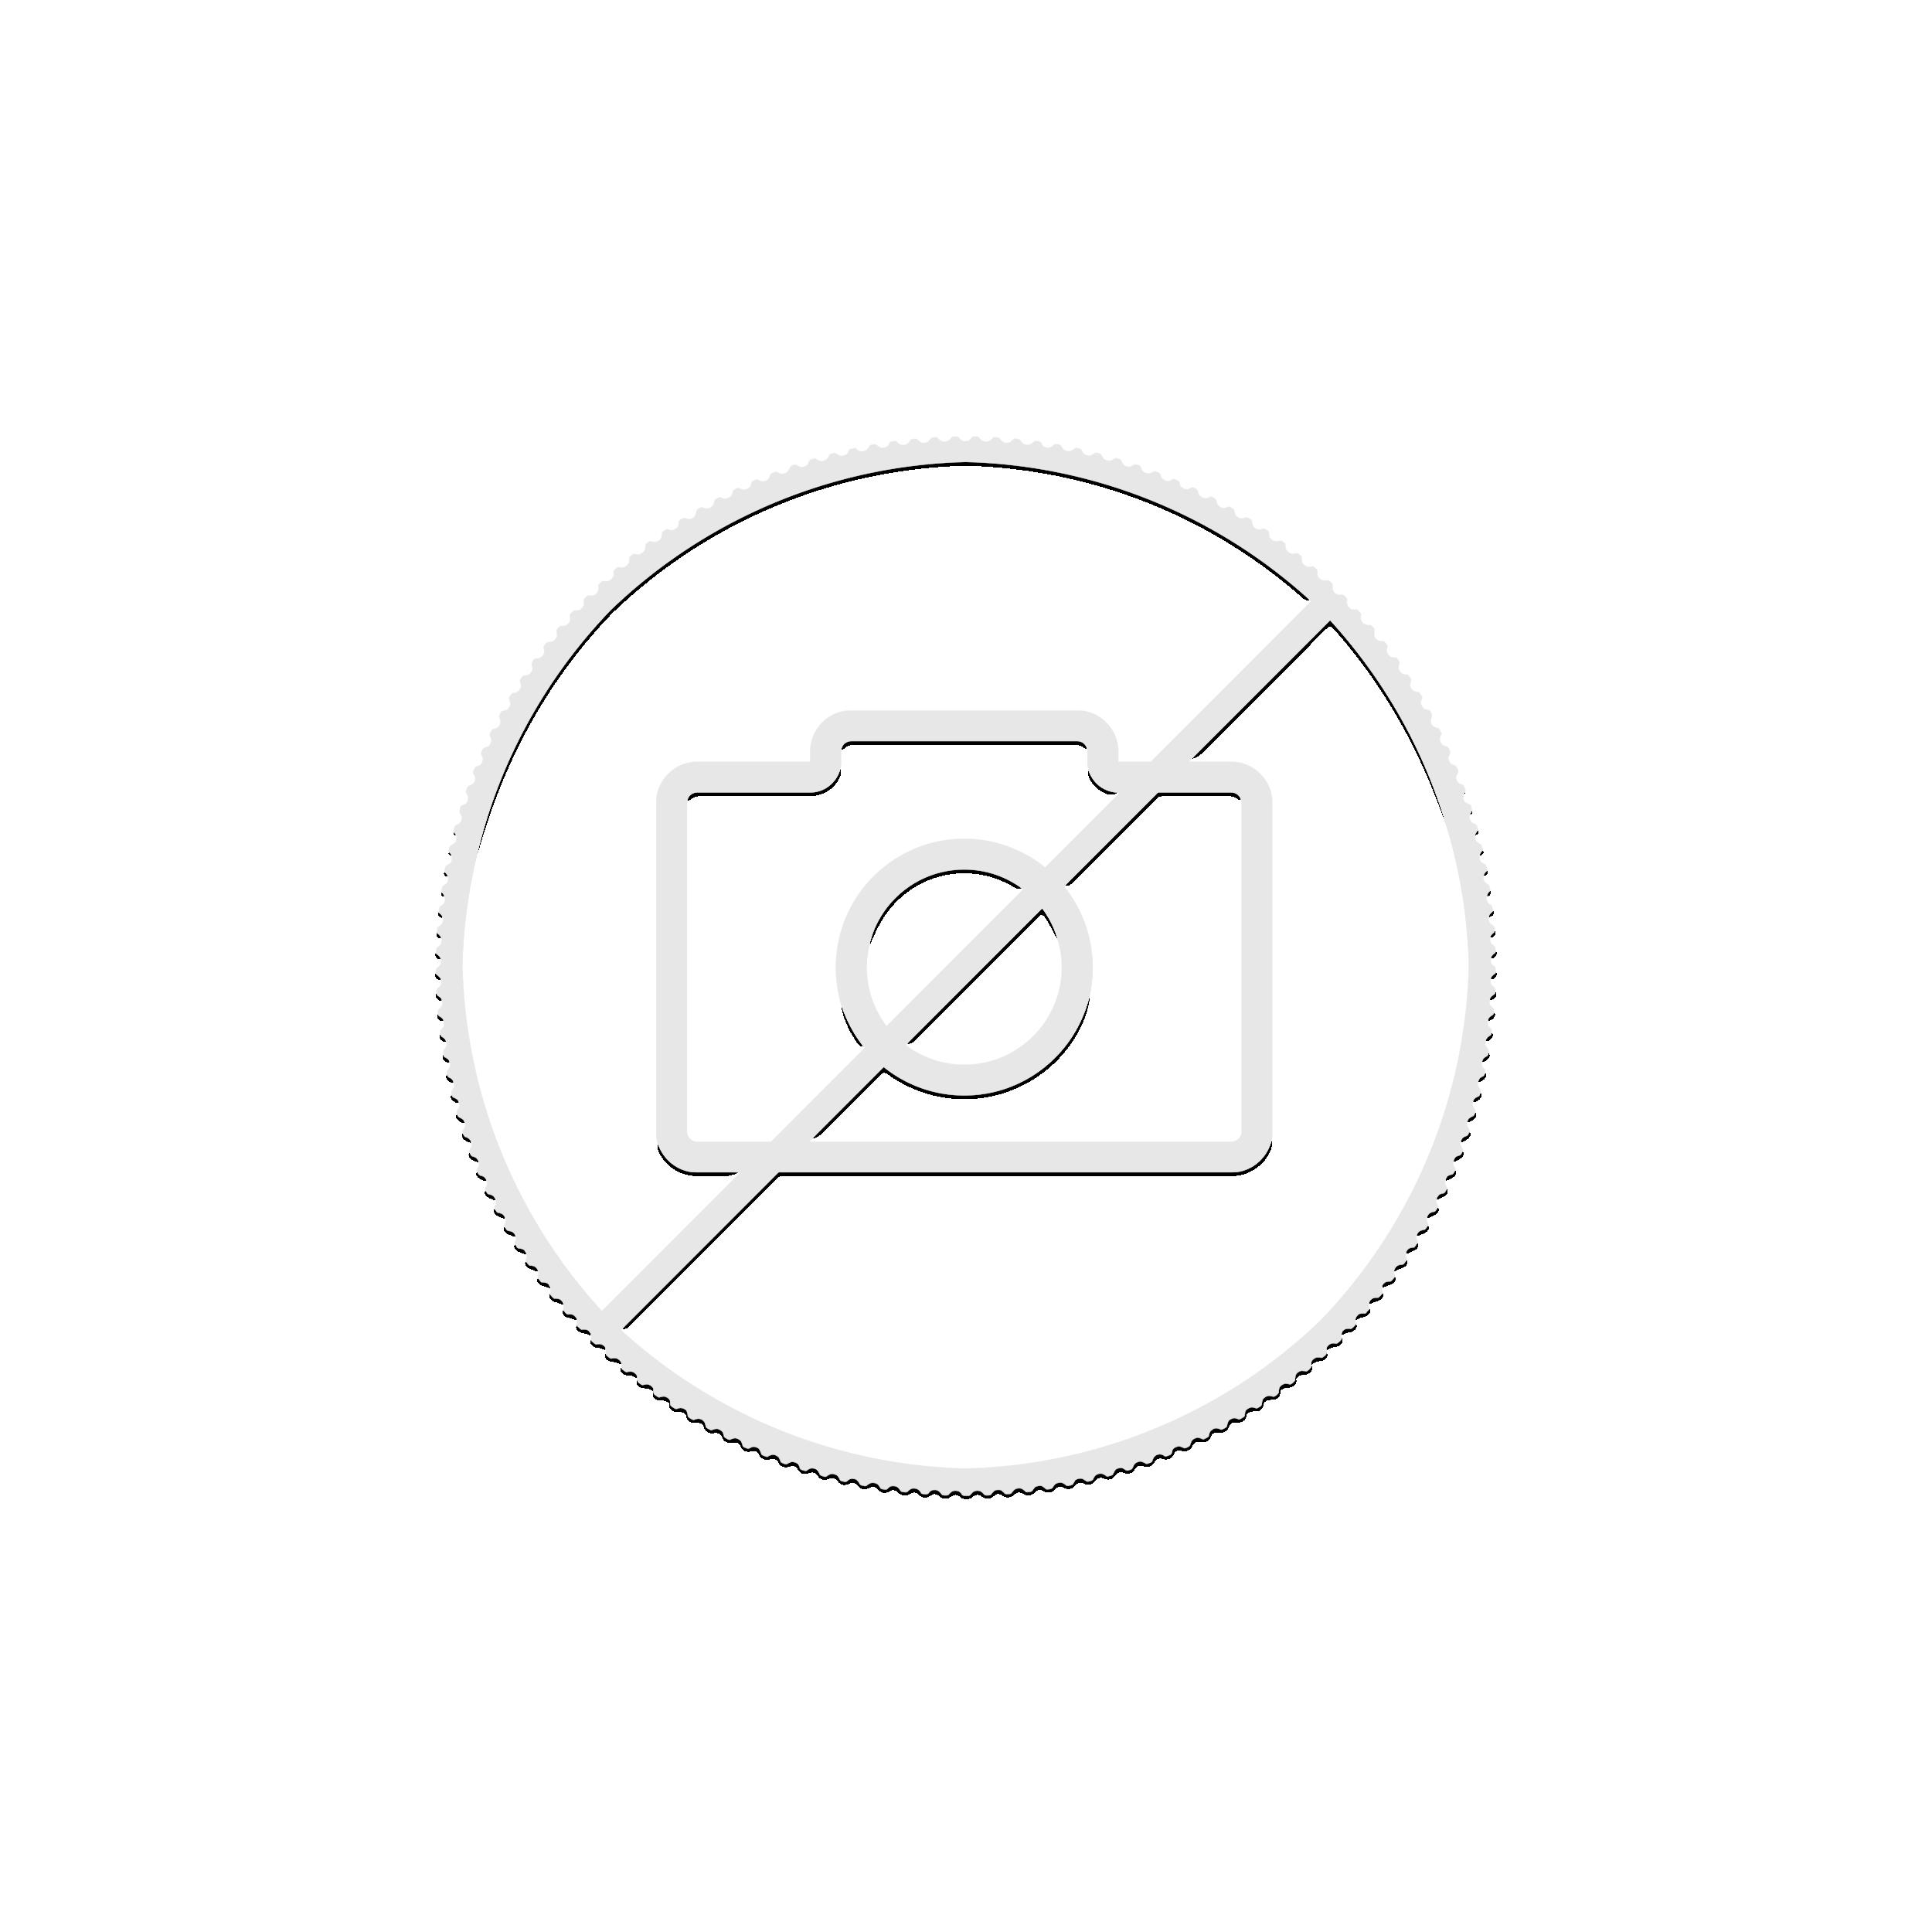 2013 Maple Leaf jubileum munt - 25 jaar